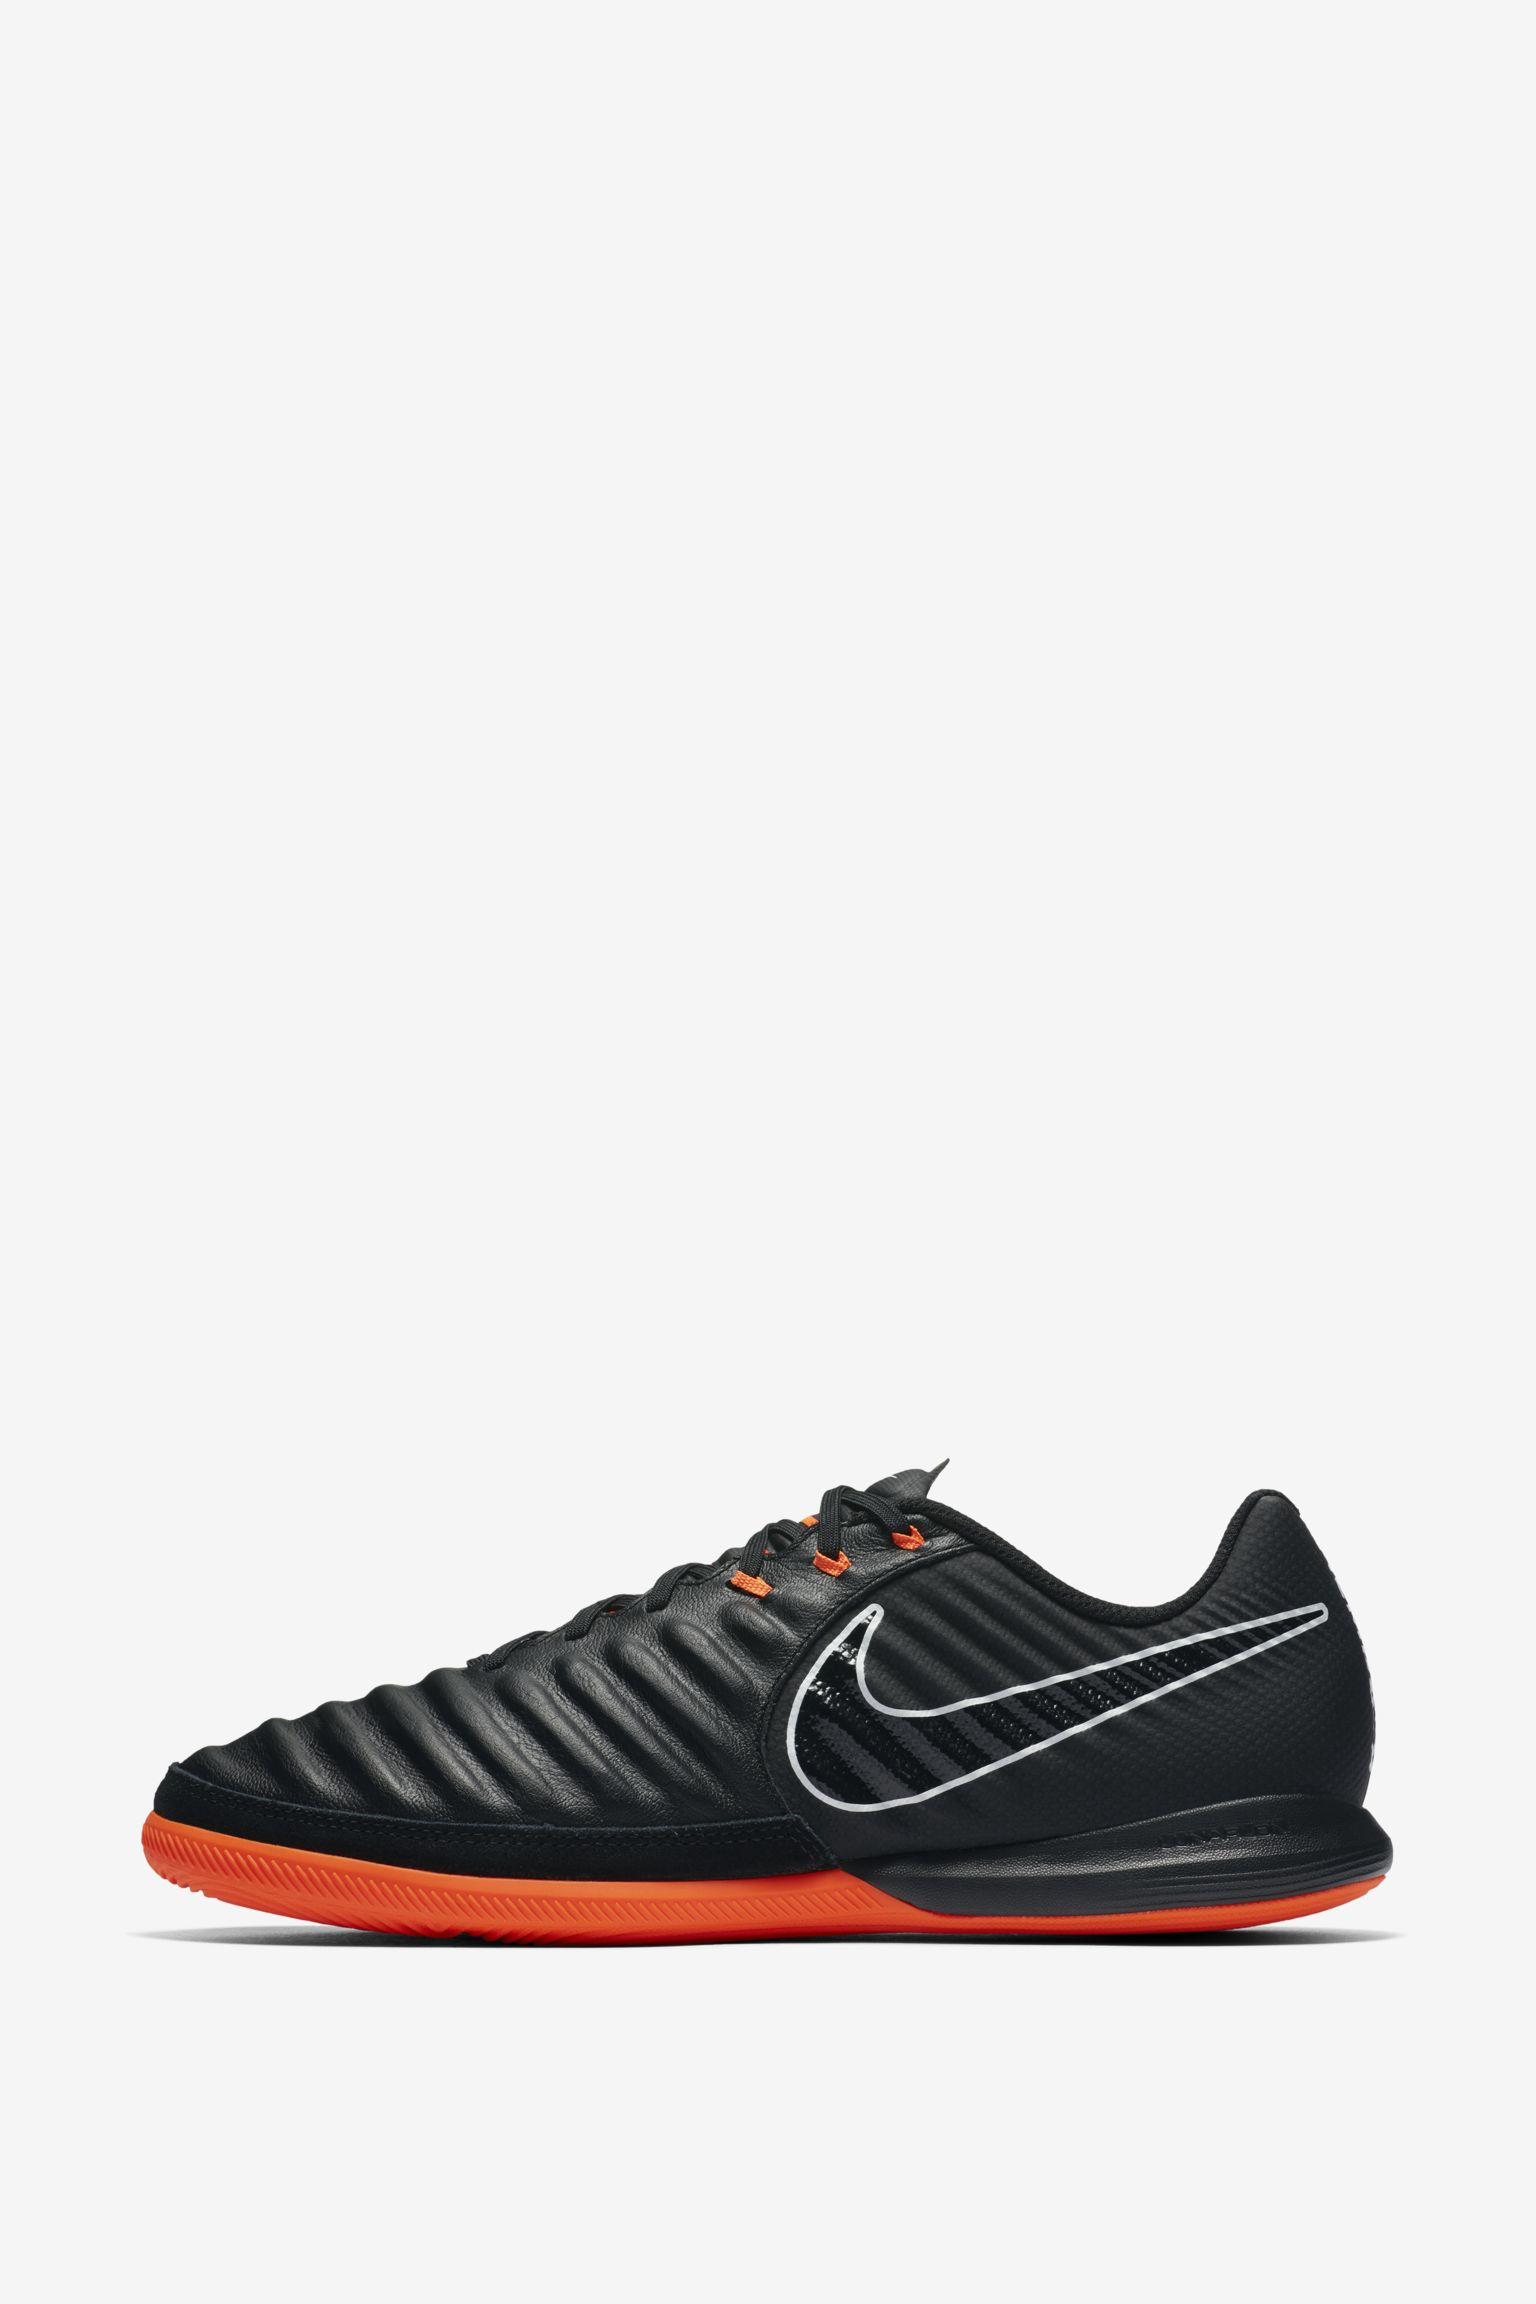 Nike Lunar Legendx 7 Pro Ic Sitios Web De Venta Baratos 47xSAacWCA